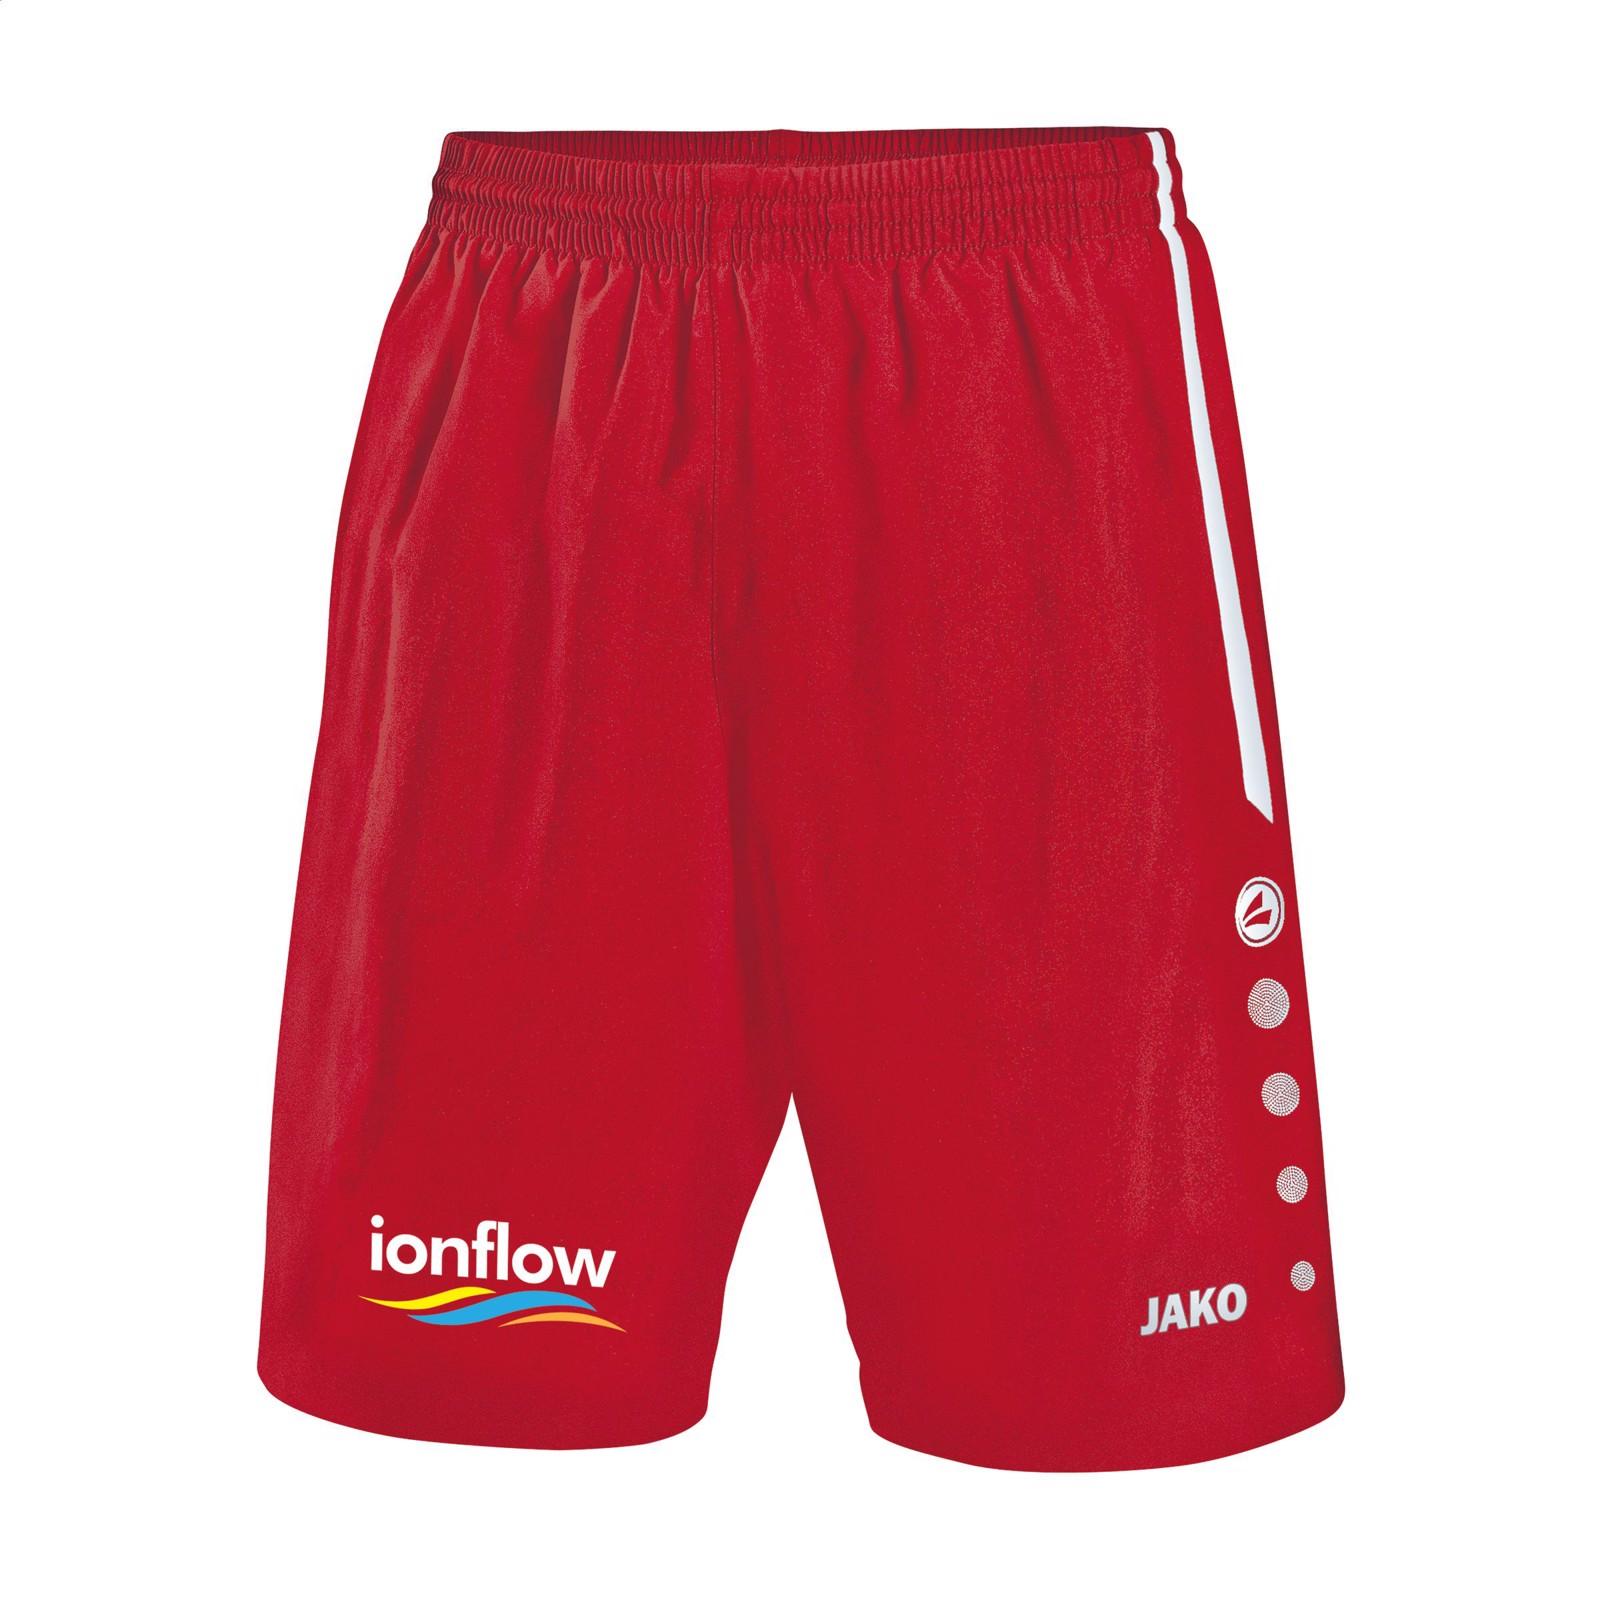 Jako® Short Turin Kids sportspants - Red / White / 128